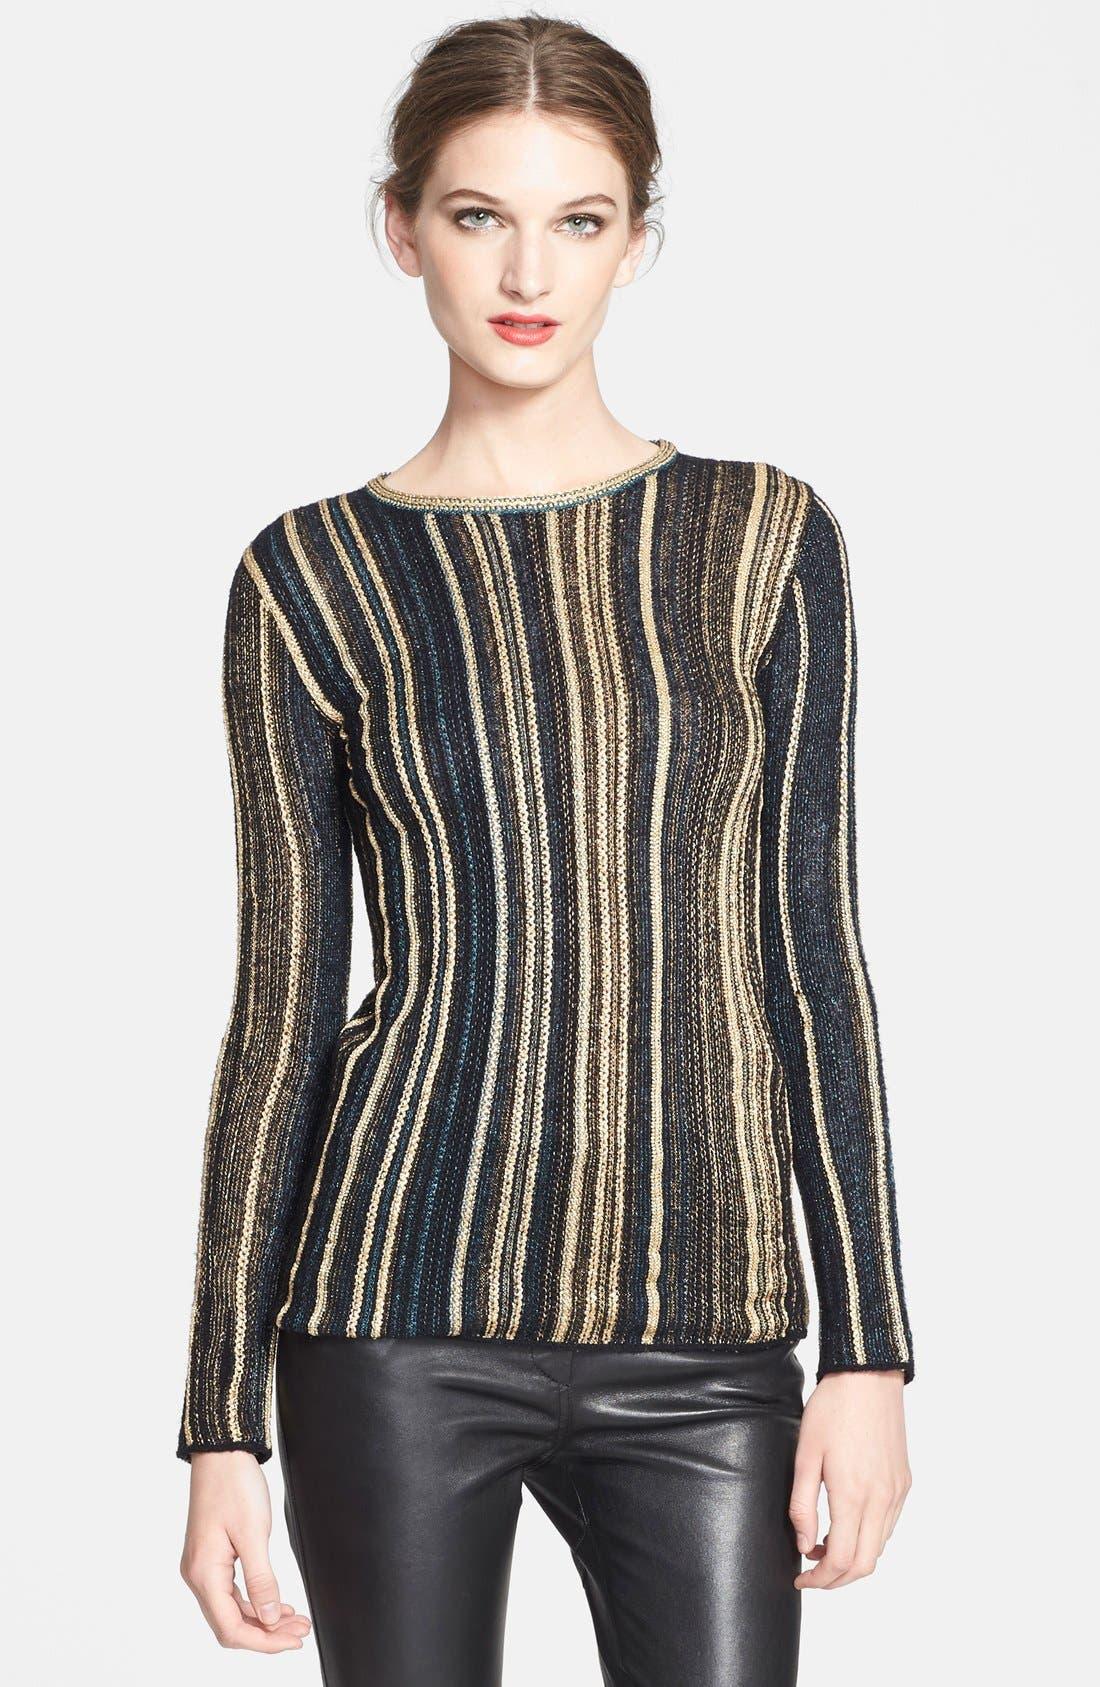 Alternate Image 1 Selected - M Missoni Vertical Stripe Knit Top